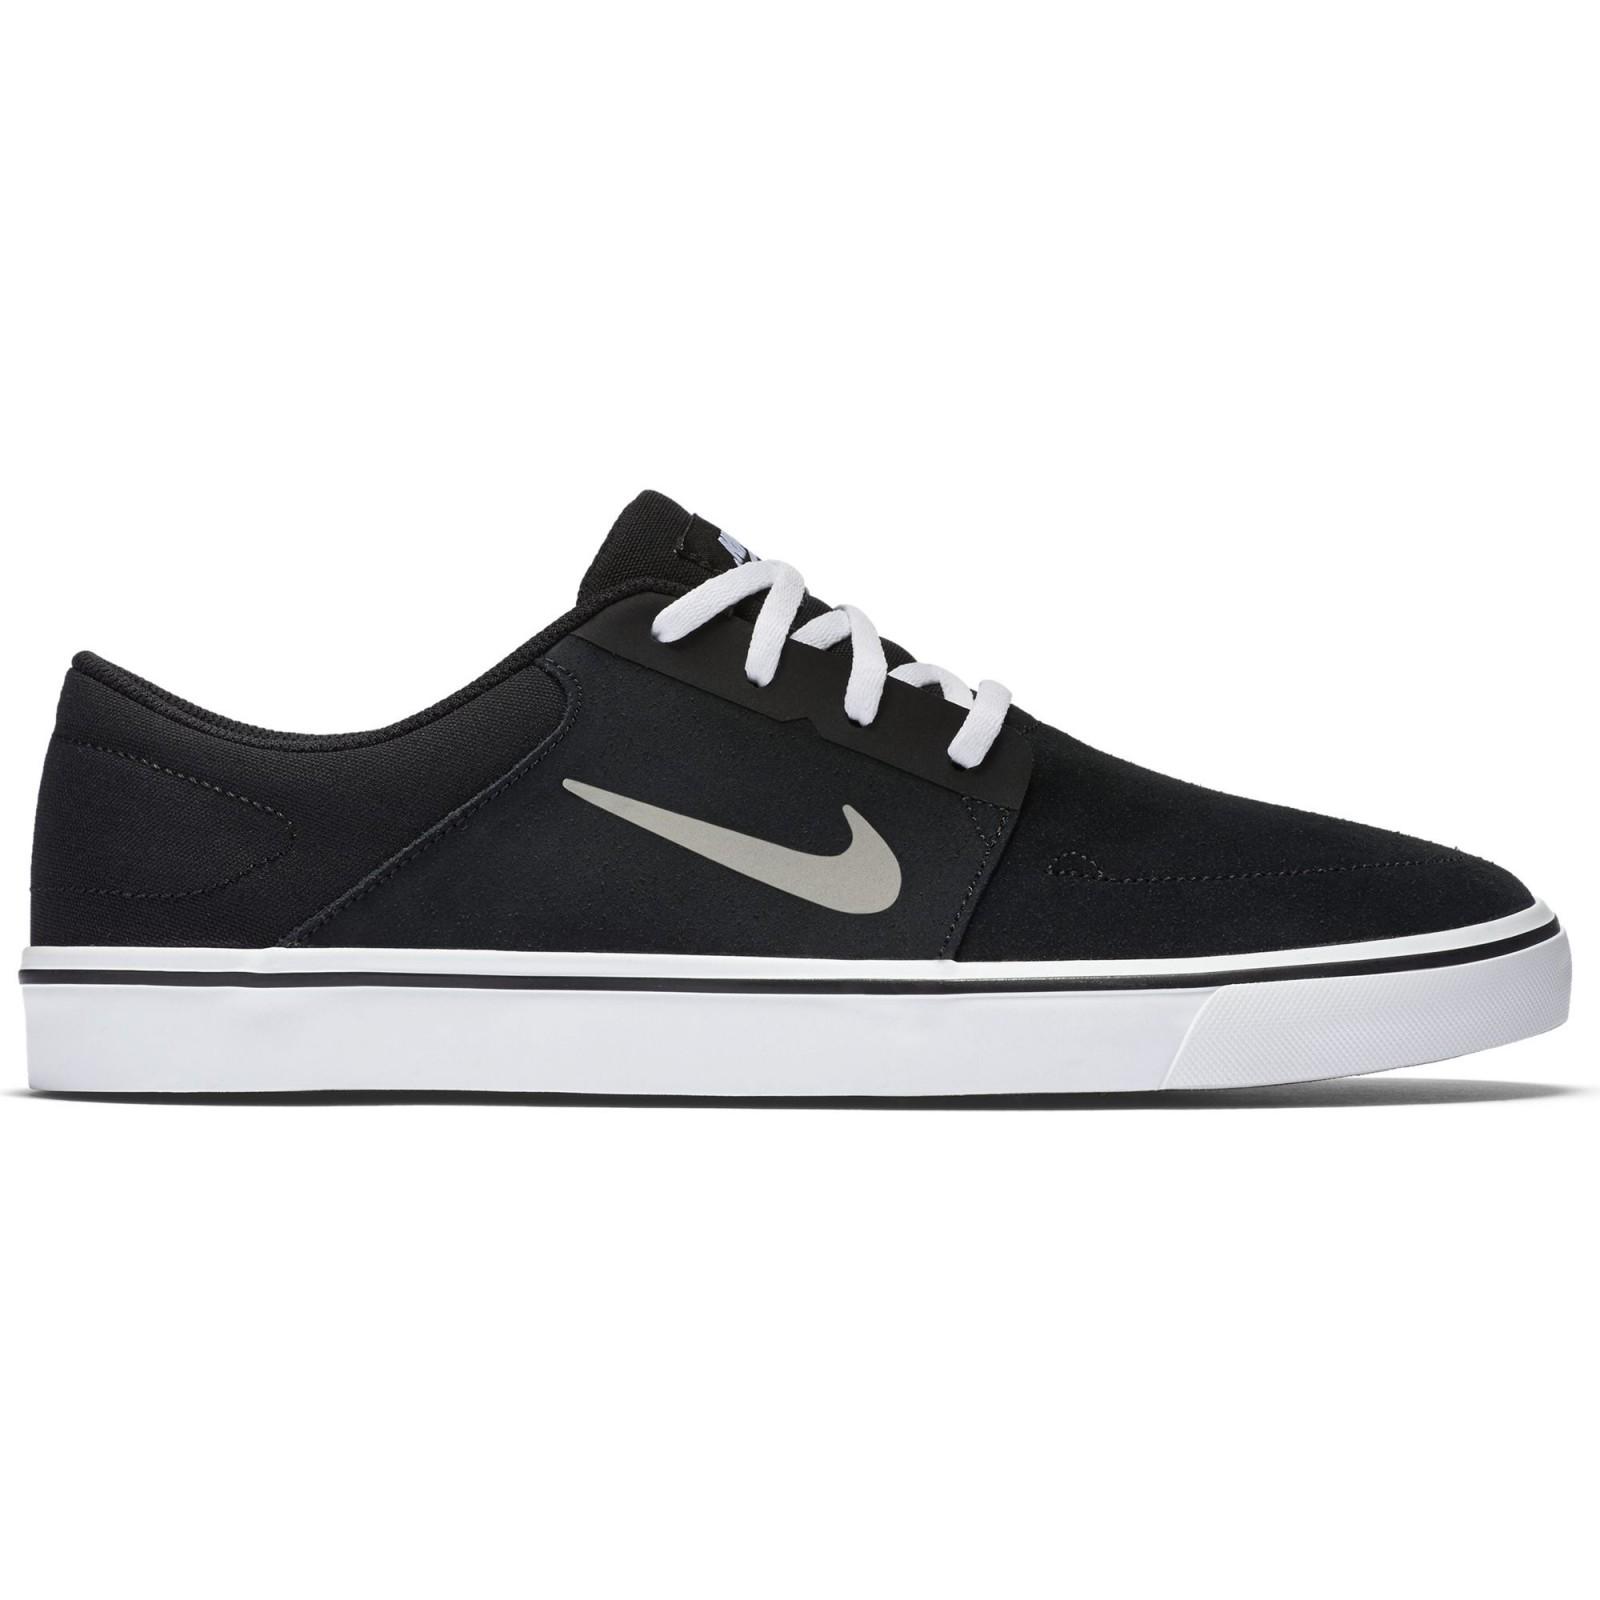 Pánské tenisky Nike SB PORTMORE  b2da70c7a6